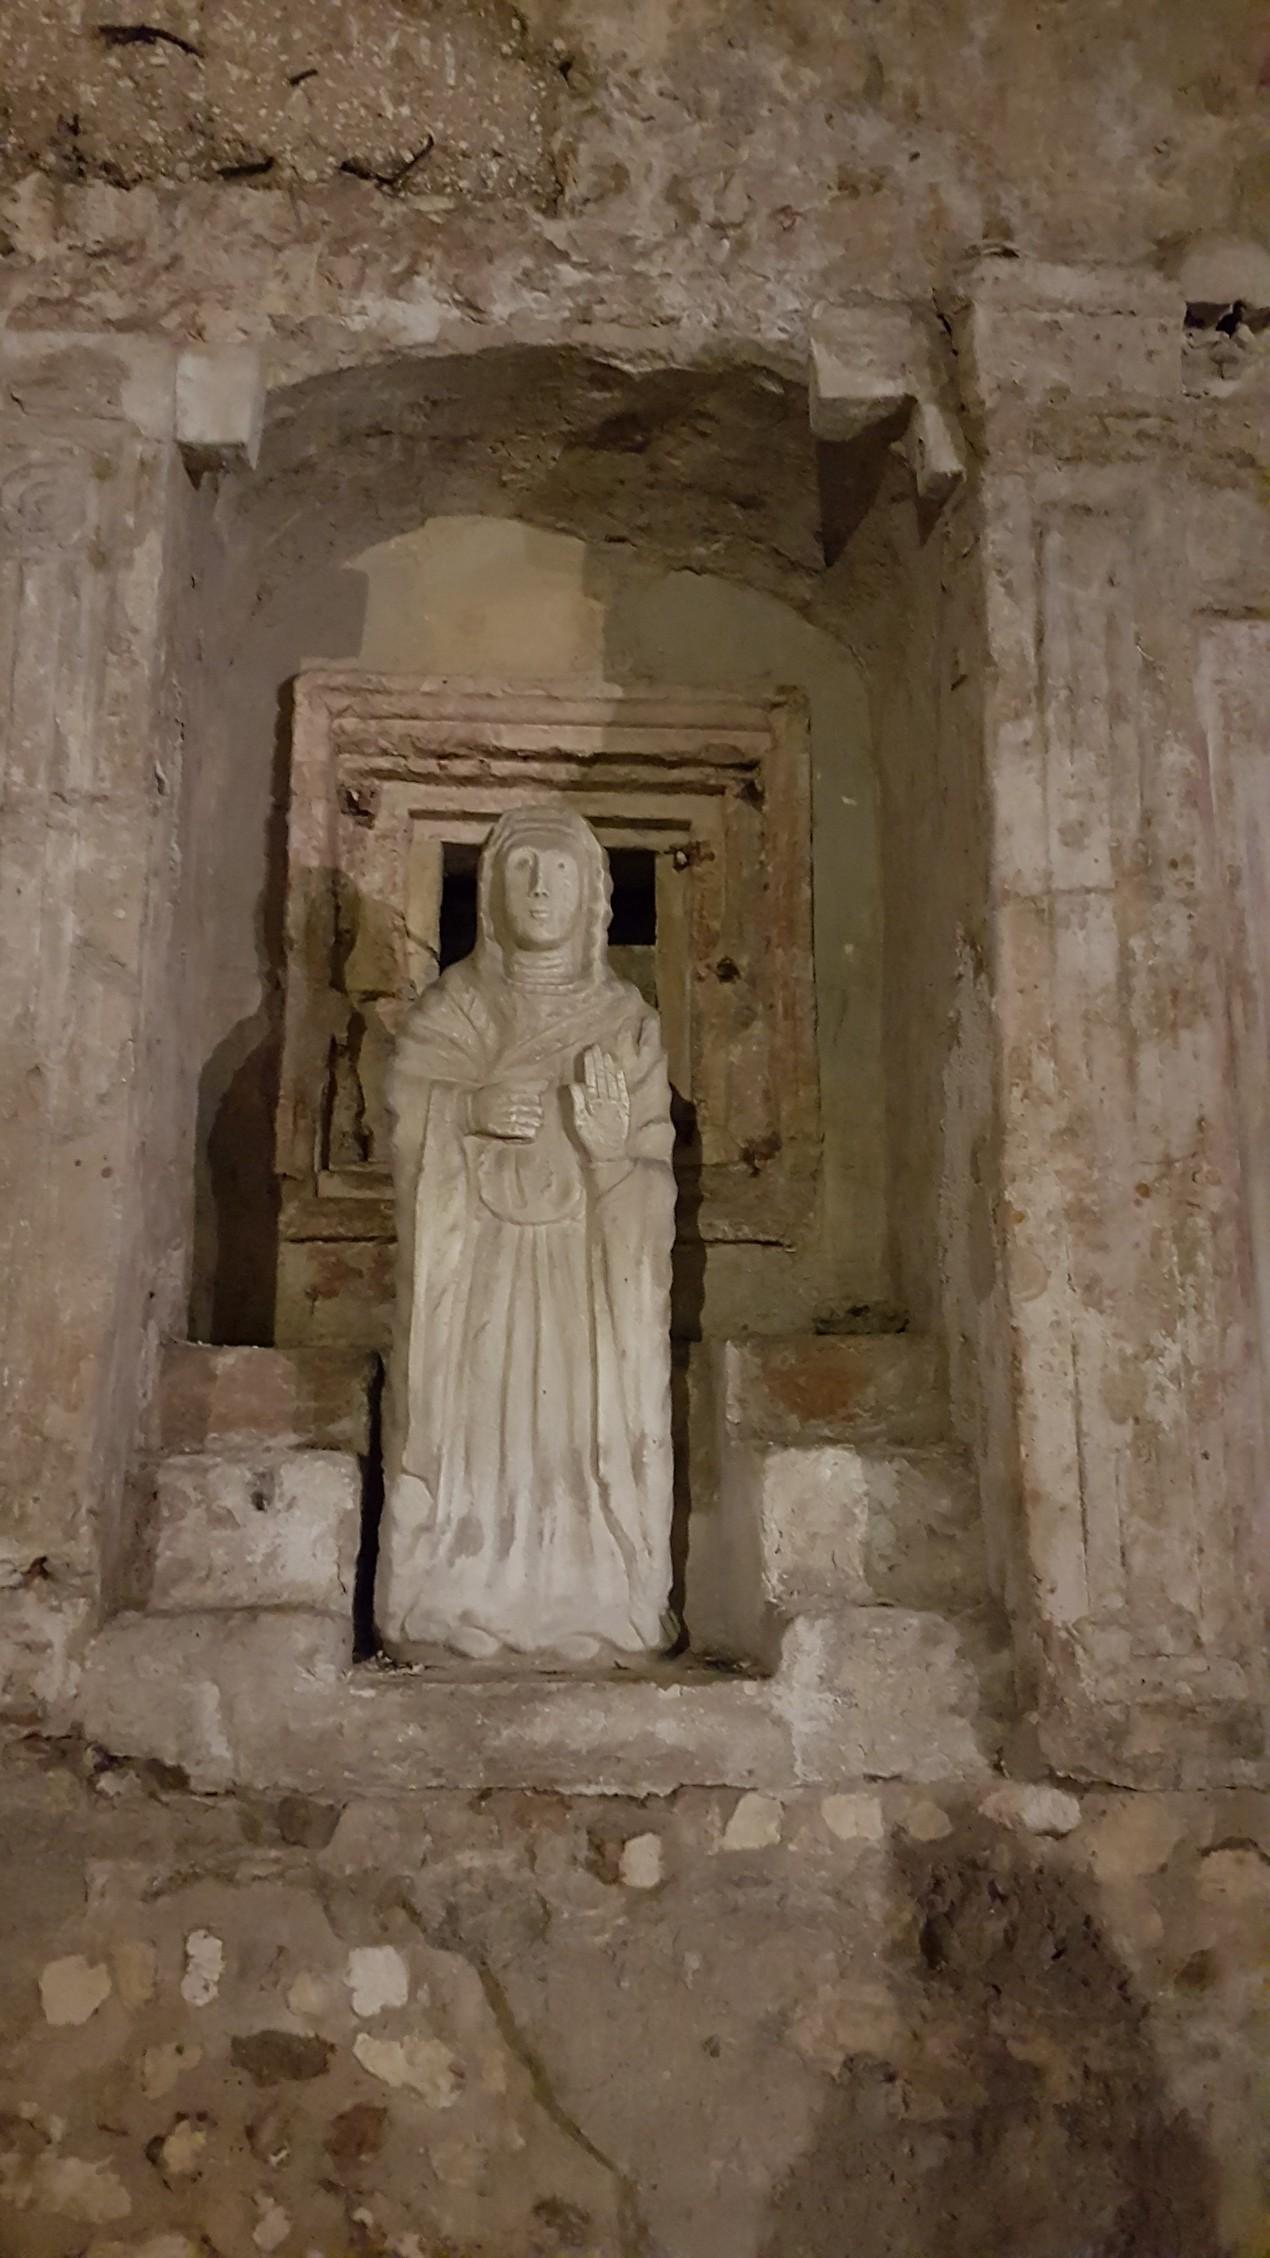 Resultado de imagem para santa Restituta martirio crypta